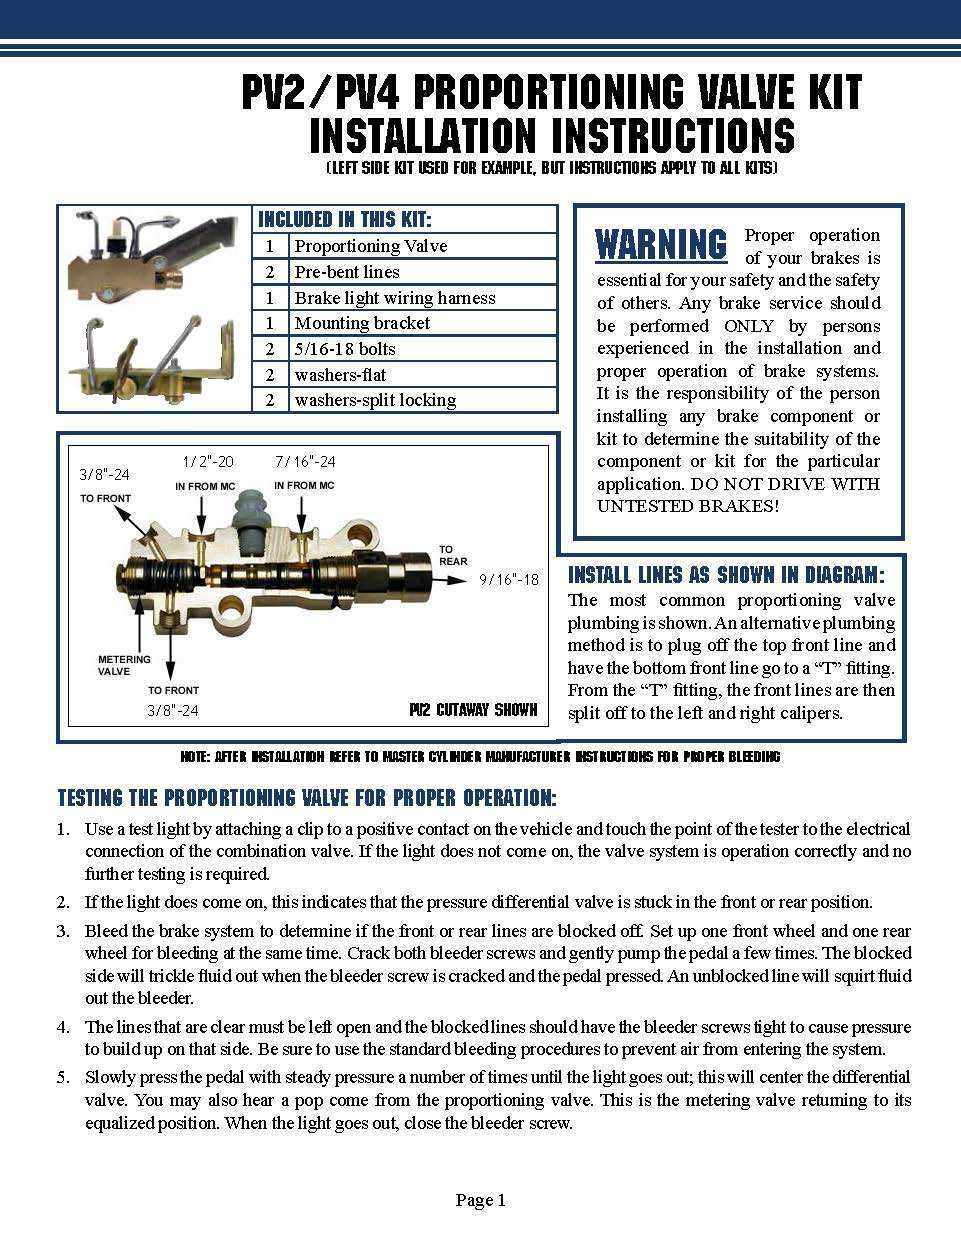 1 Bore Master Cylinder Gm Universal 4 Port Disc Drum Prop 7 Flat Wiring Diagram Of 12